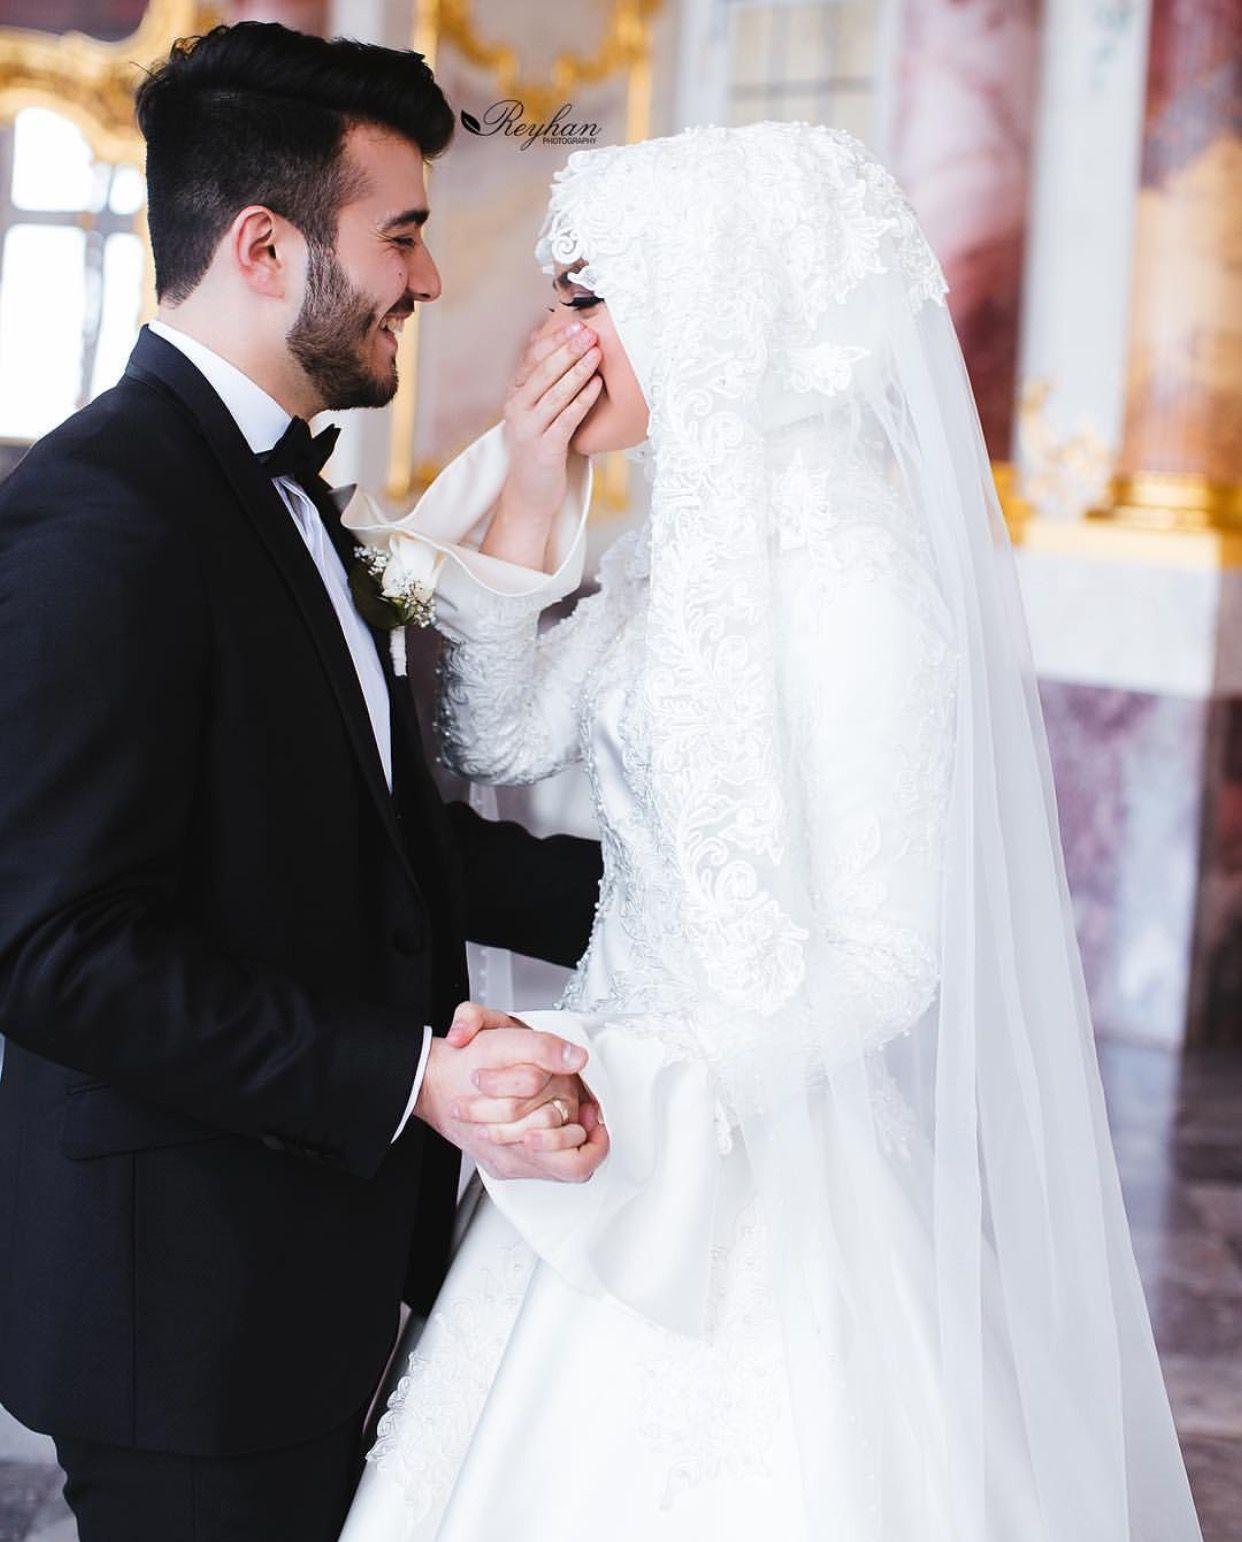 Pinterest Adarkurdish Foto Perkawinan Foto Tunangan Pengantin Muslim